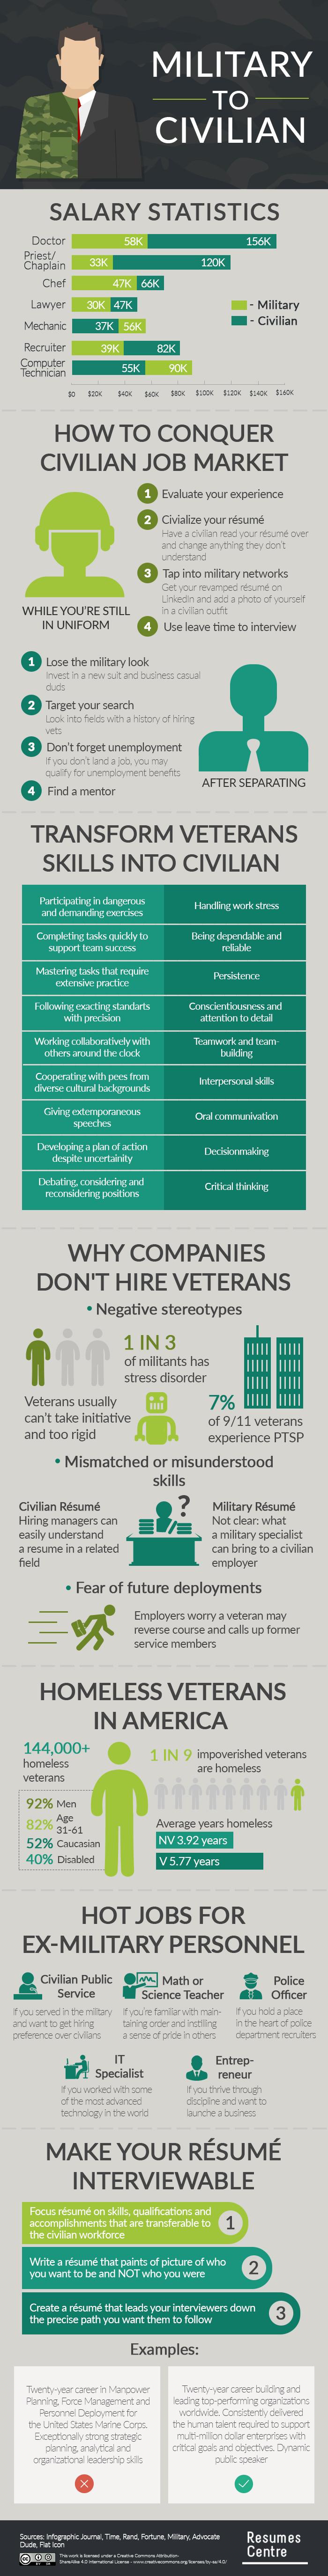 Military to Civilian [Infographic]